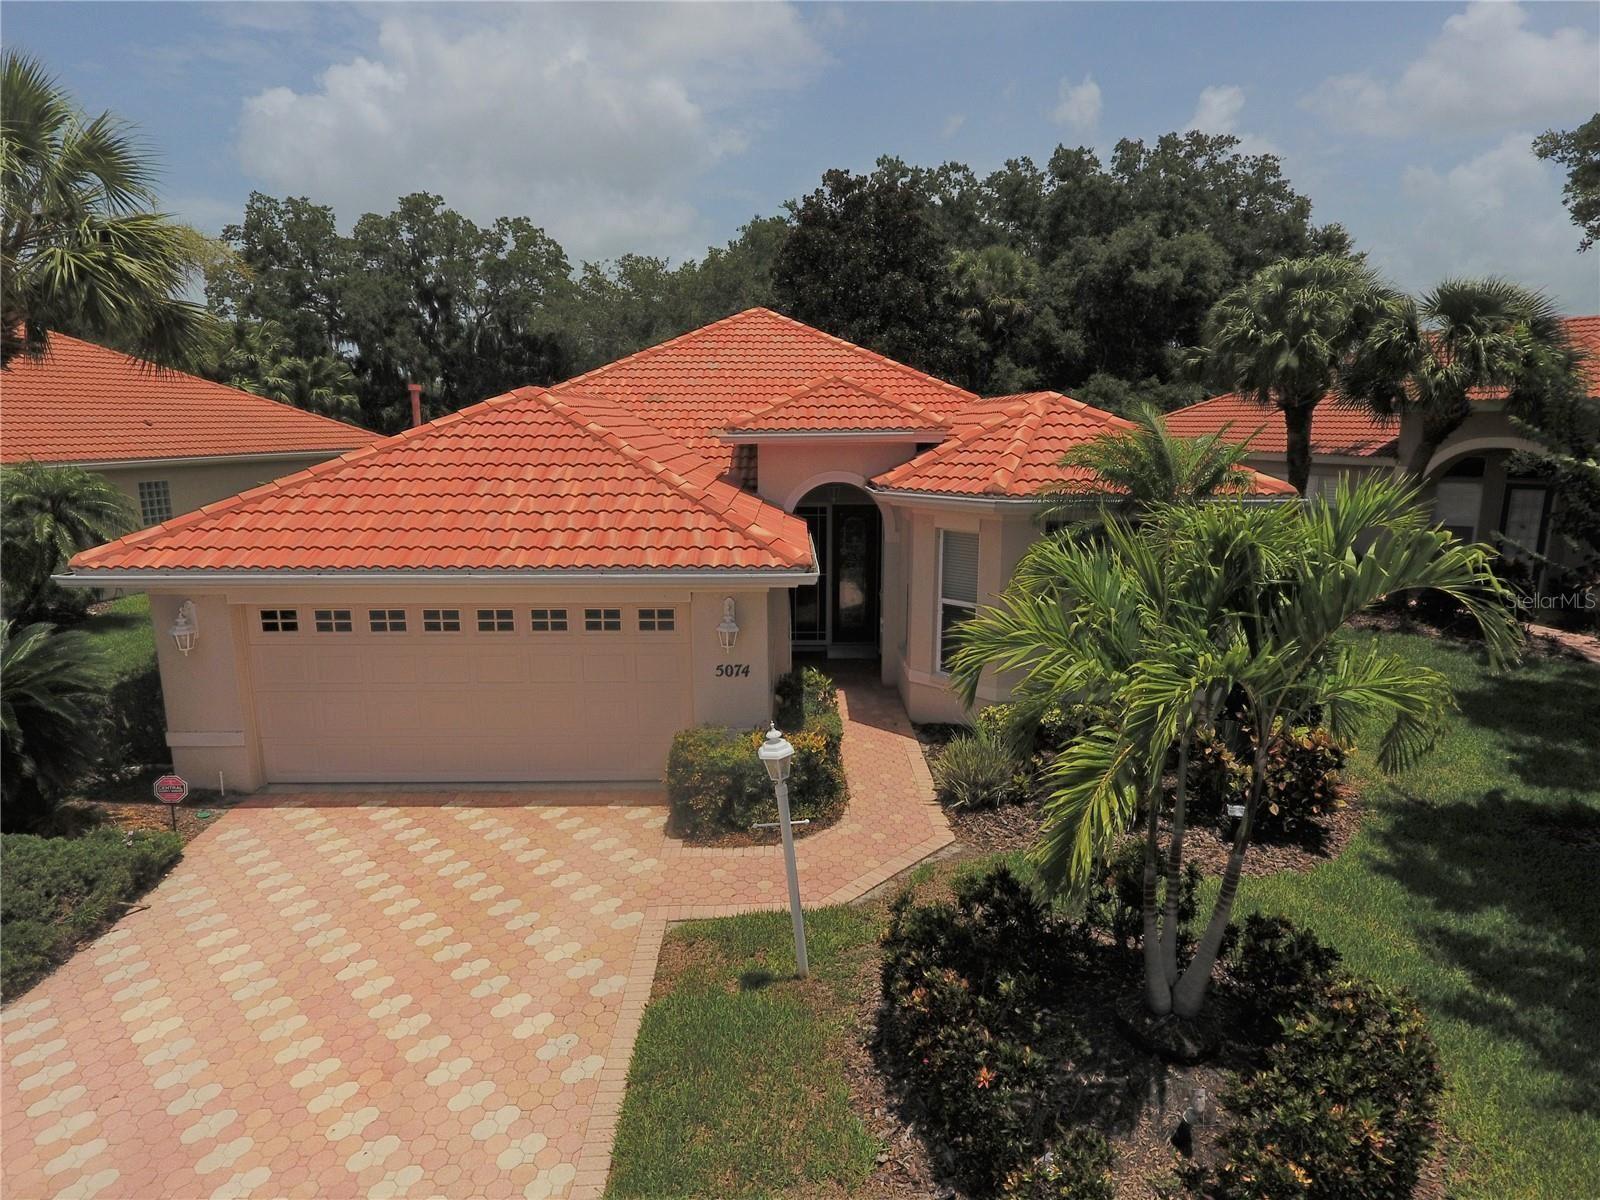 5074 HANGING MOSS LANE, Sarasota, FL 34238 - #: A4504506